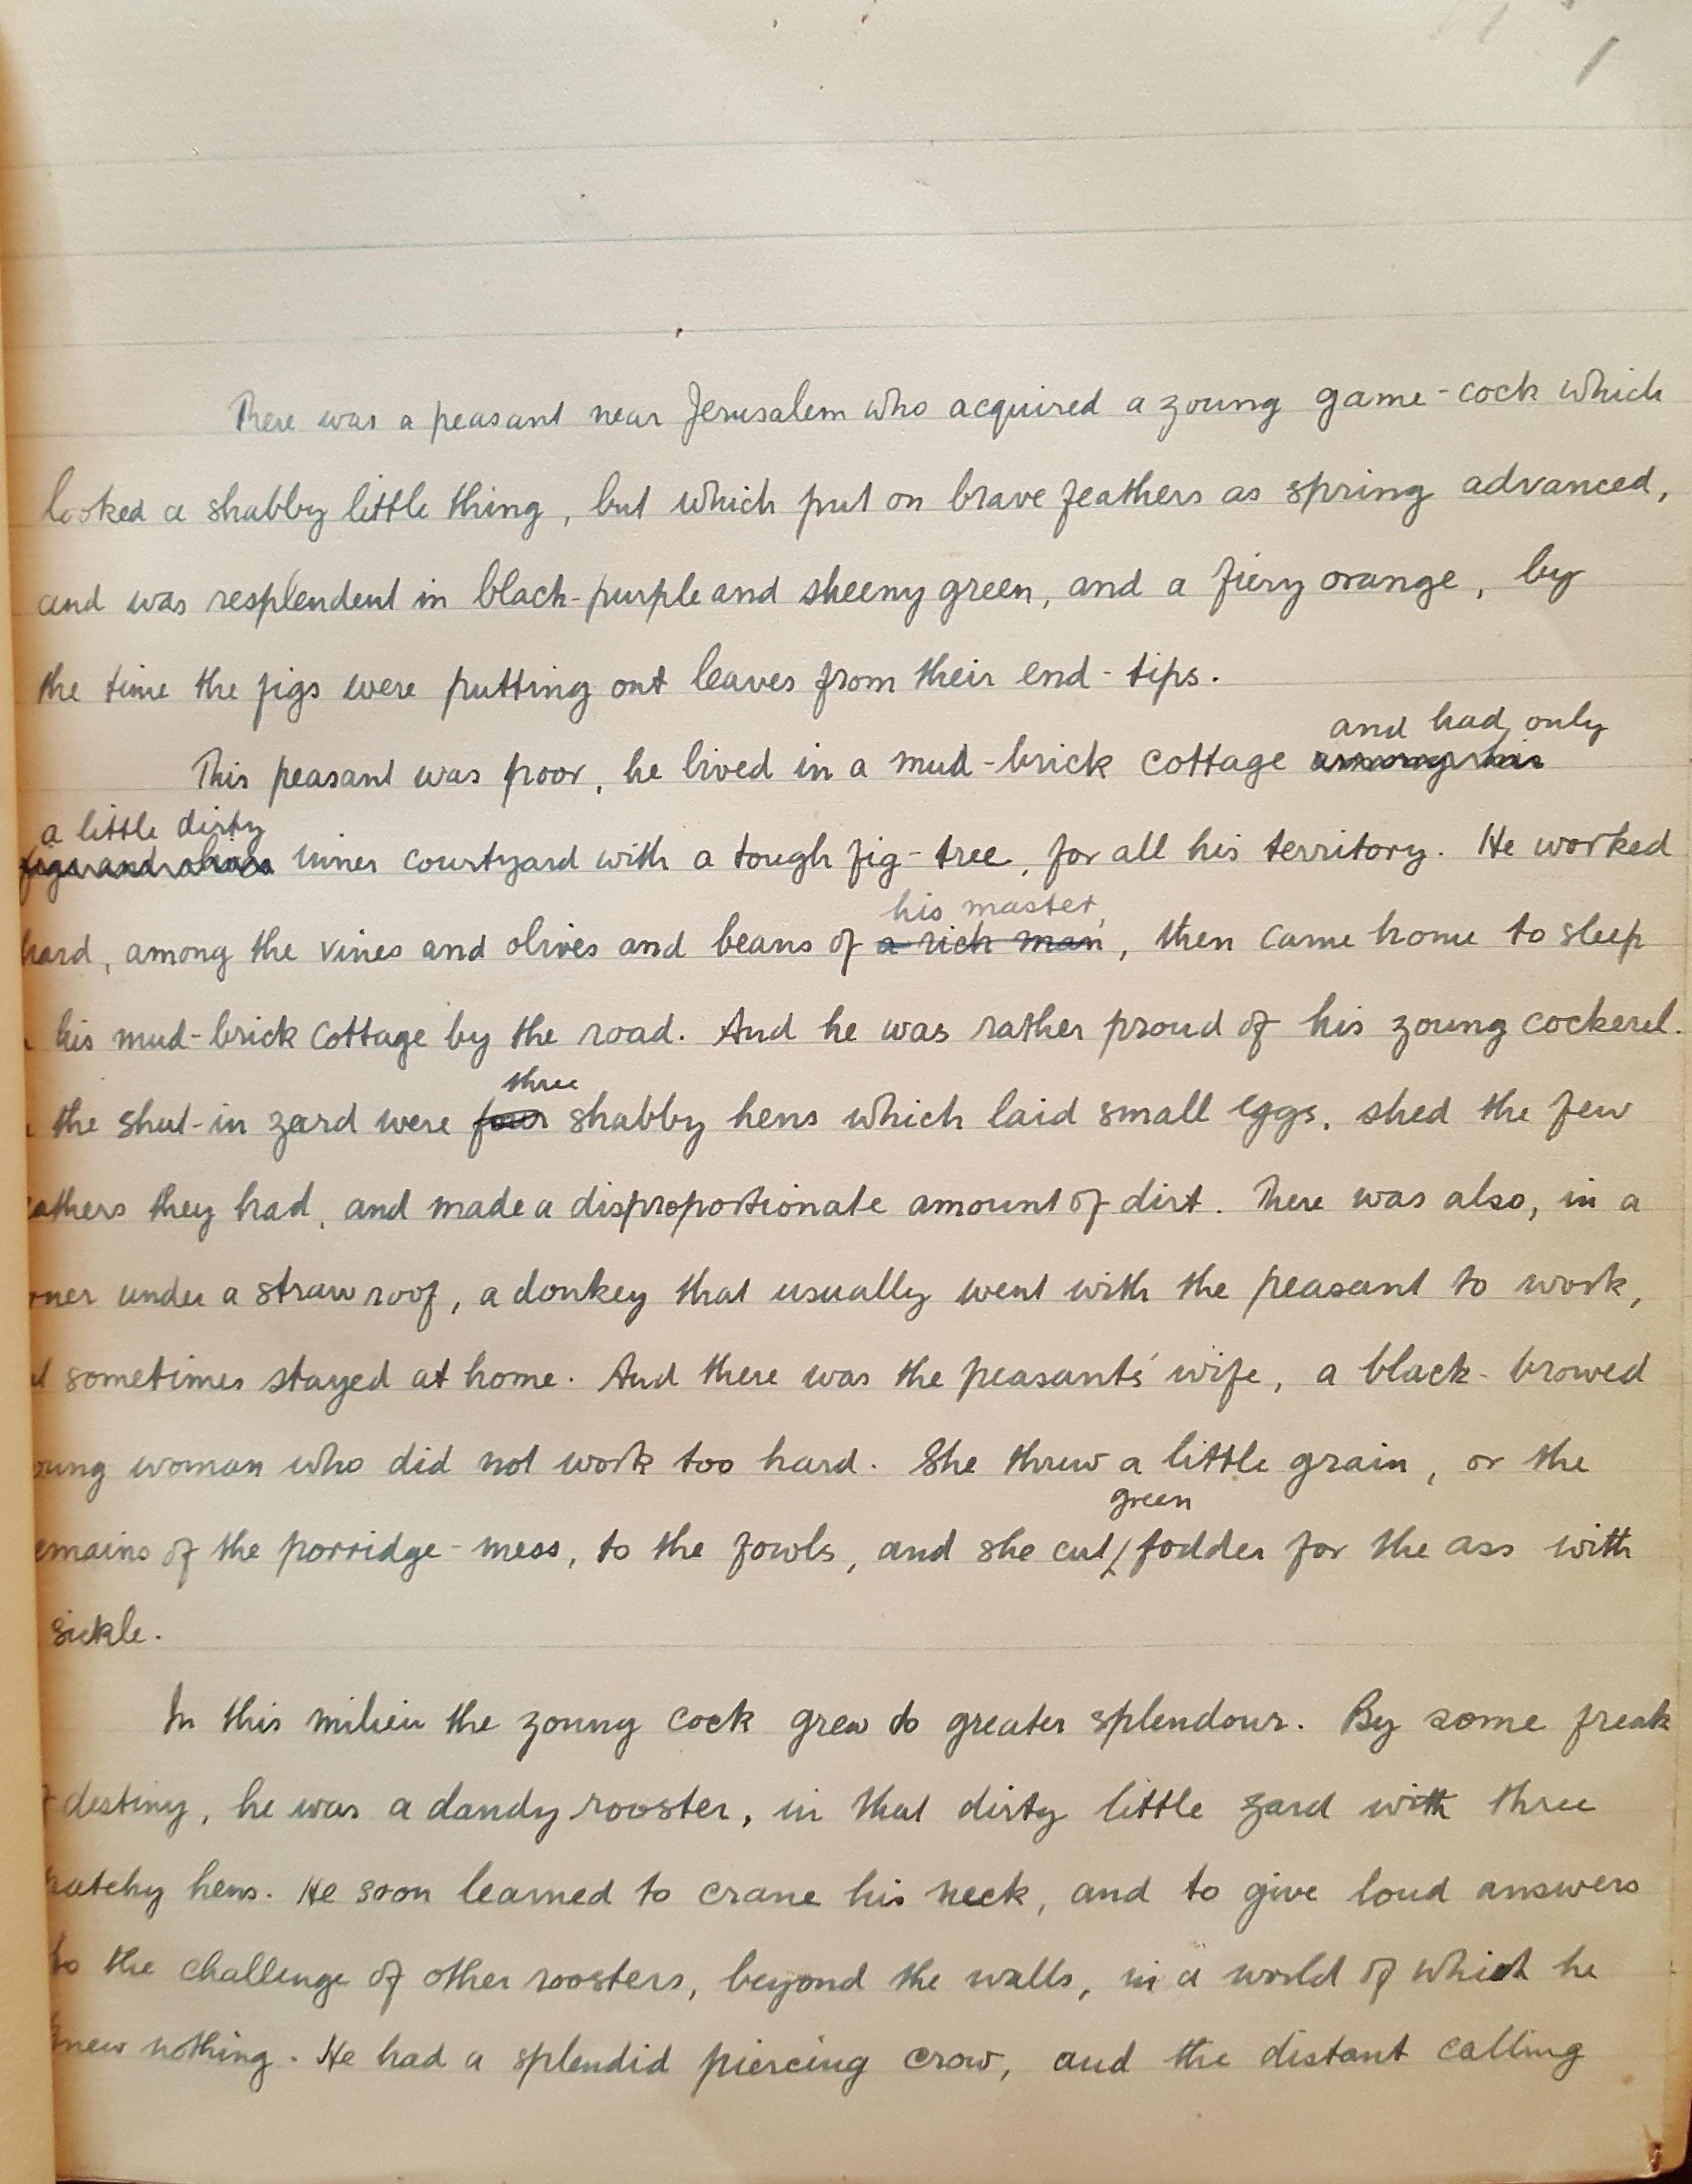 DH Lawrence manuscript